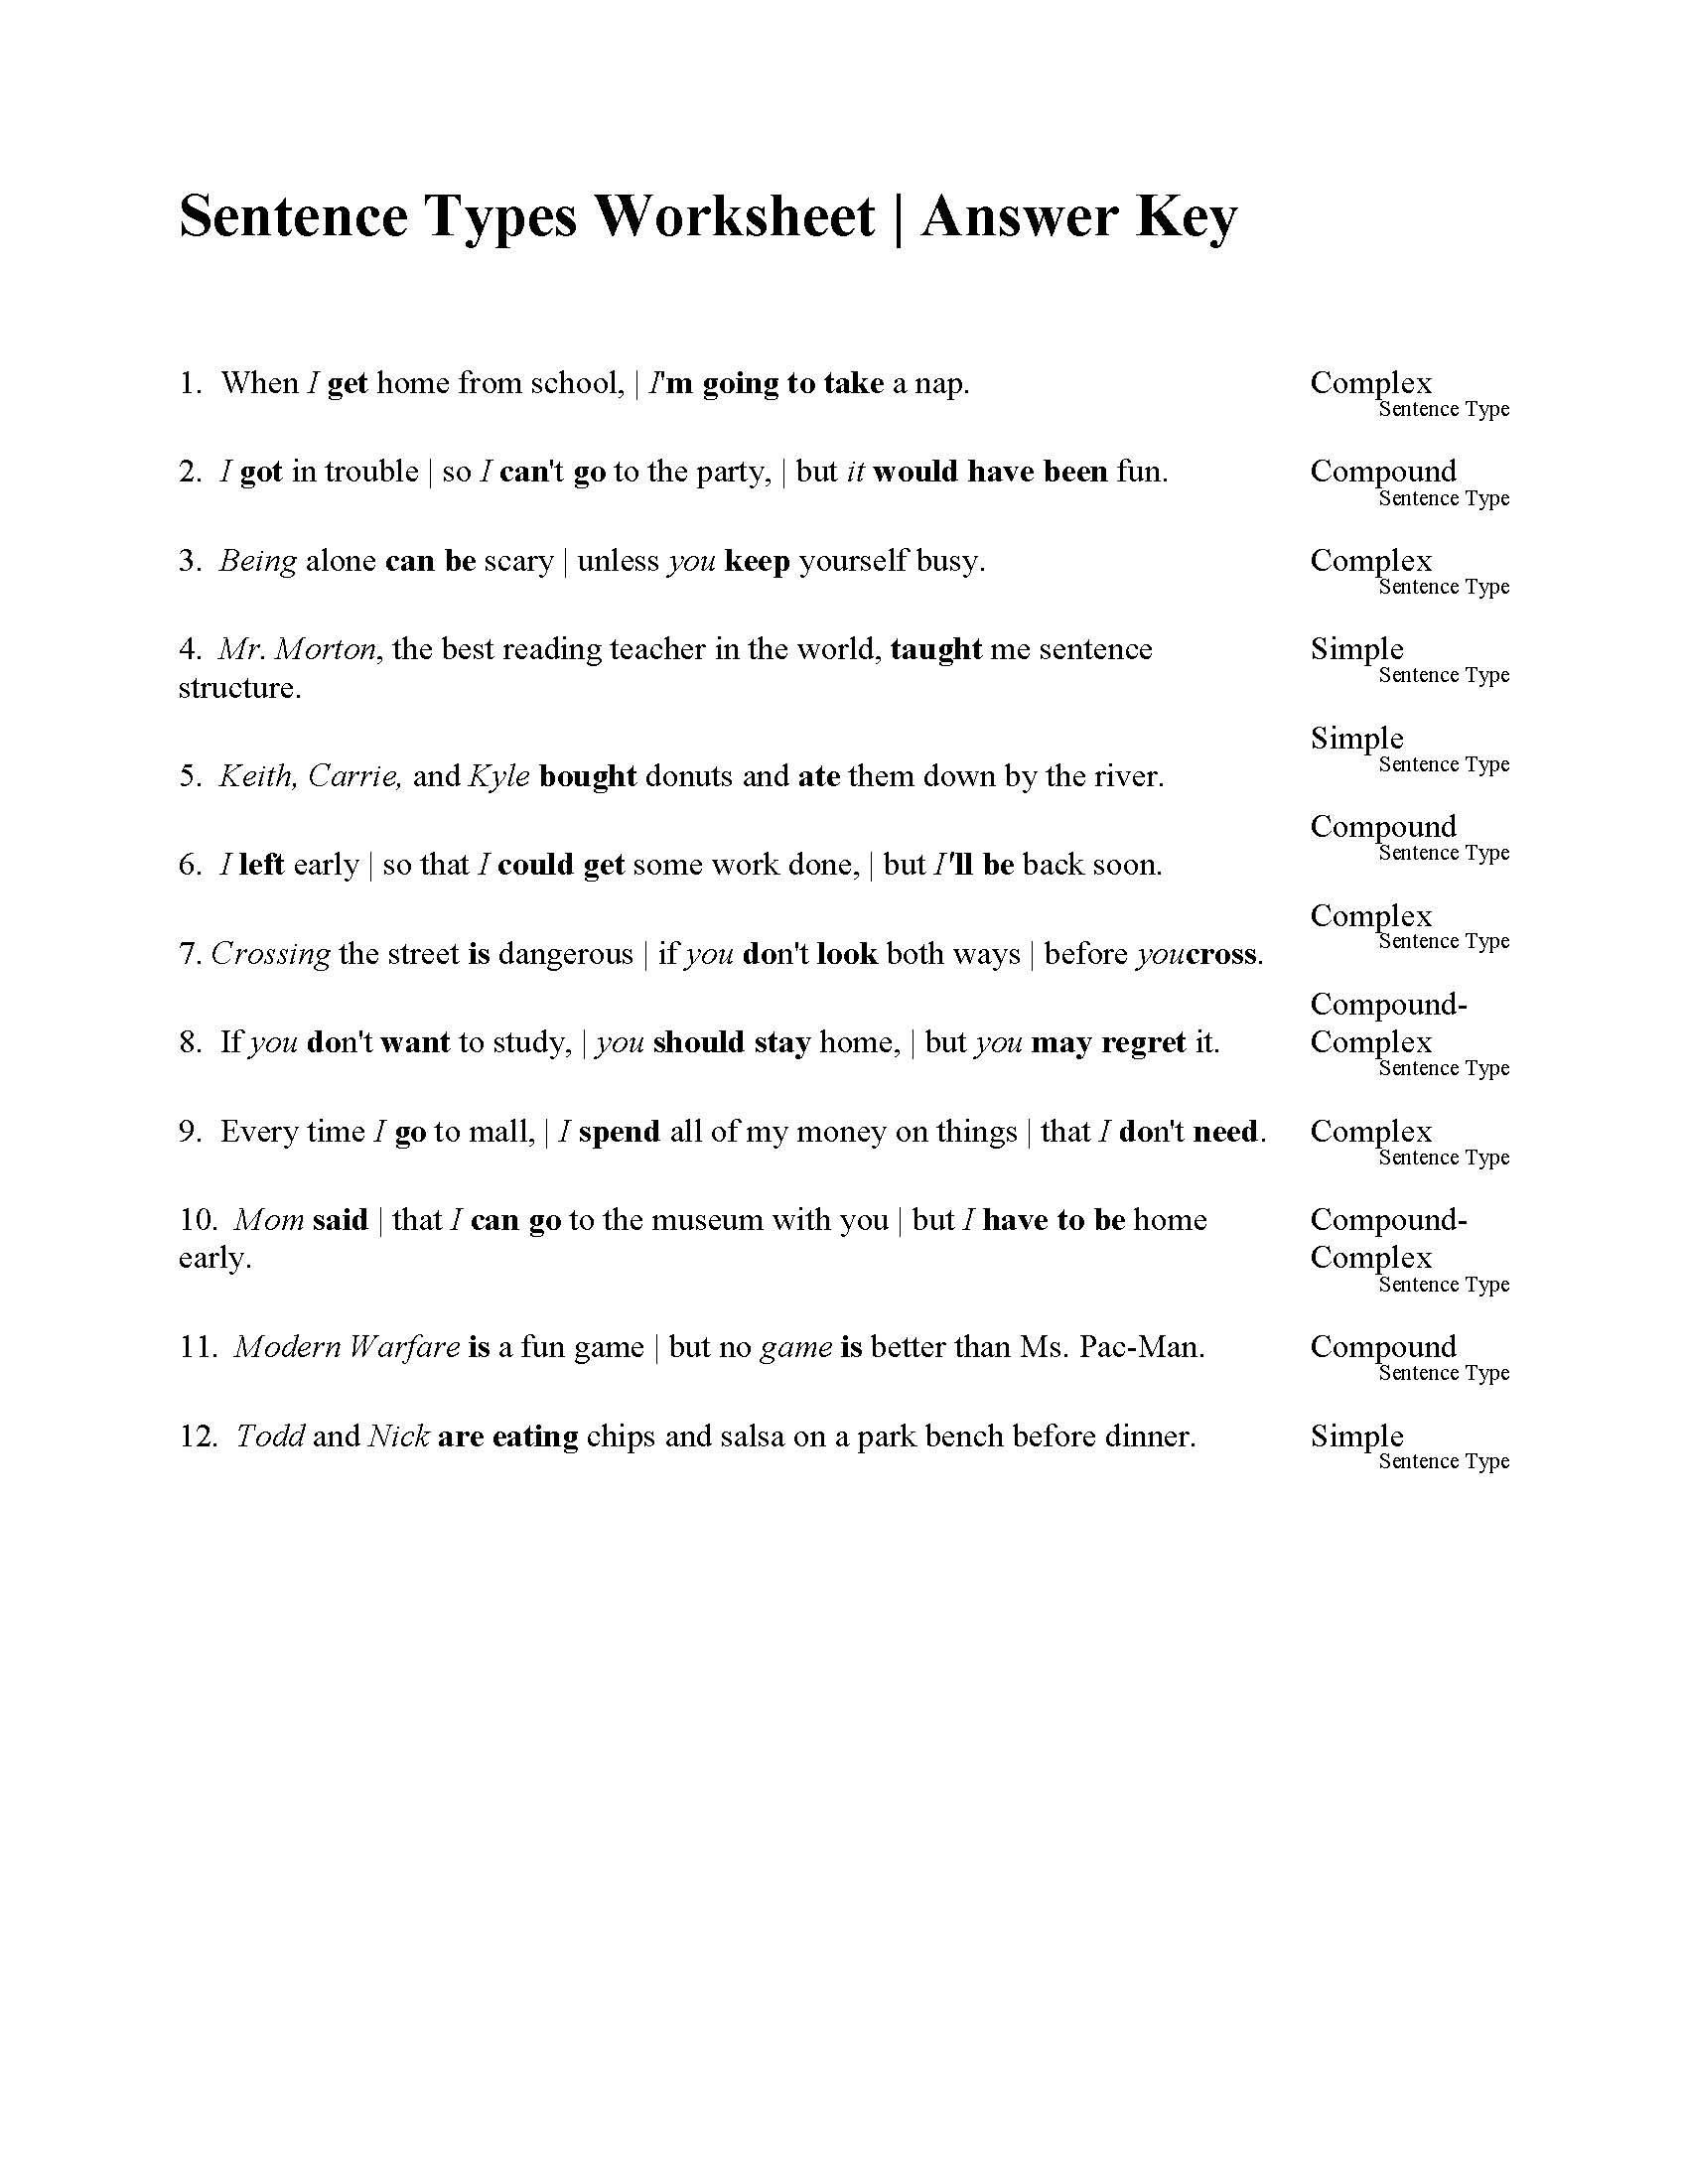 Compound Sentences Worksheet Pdf Sentences Types Worksheet